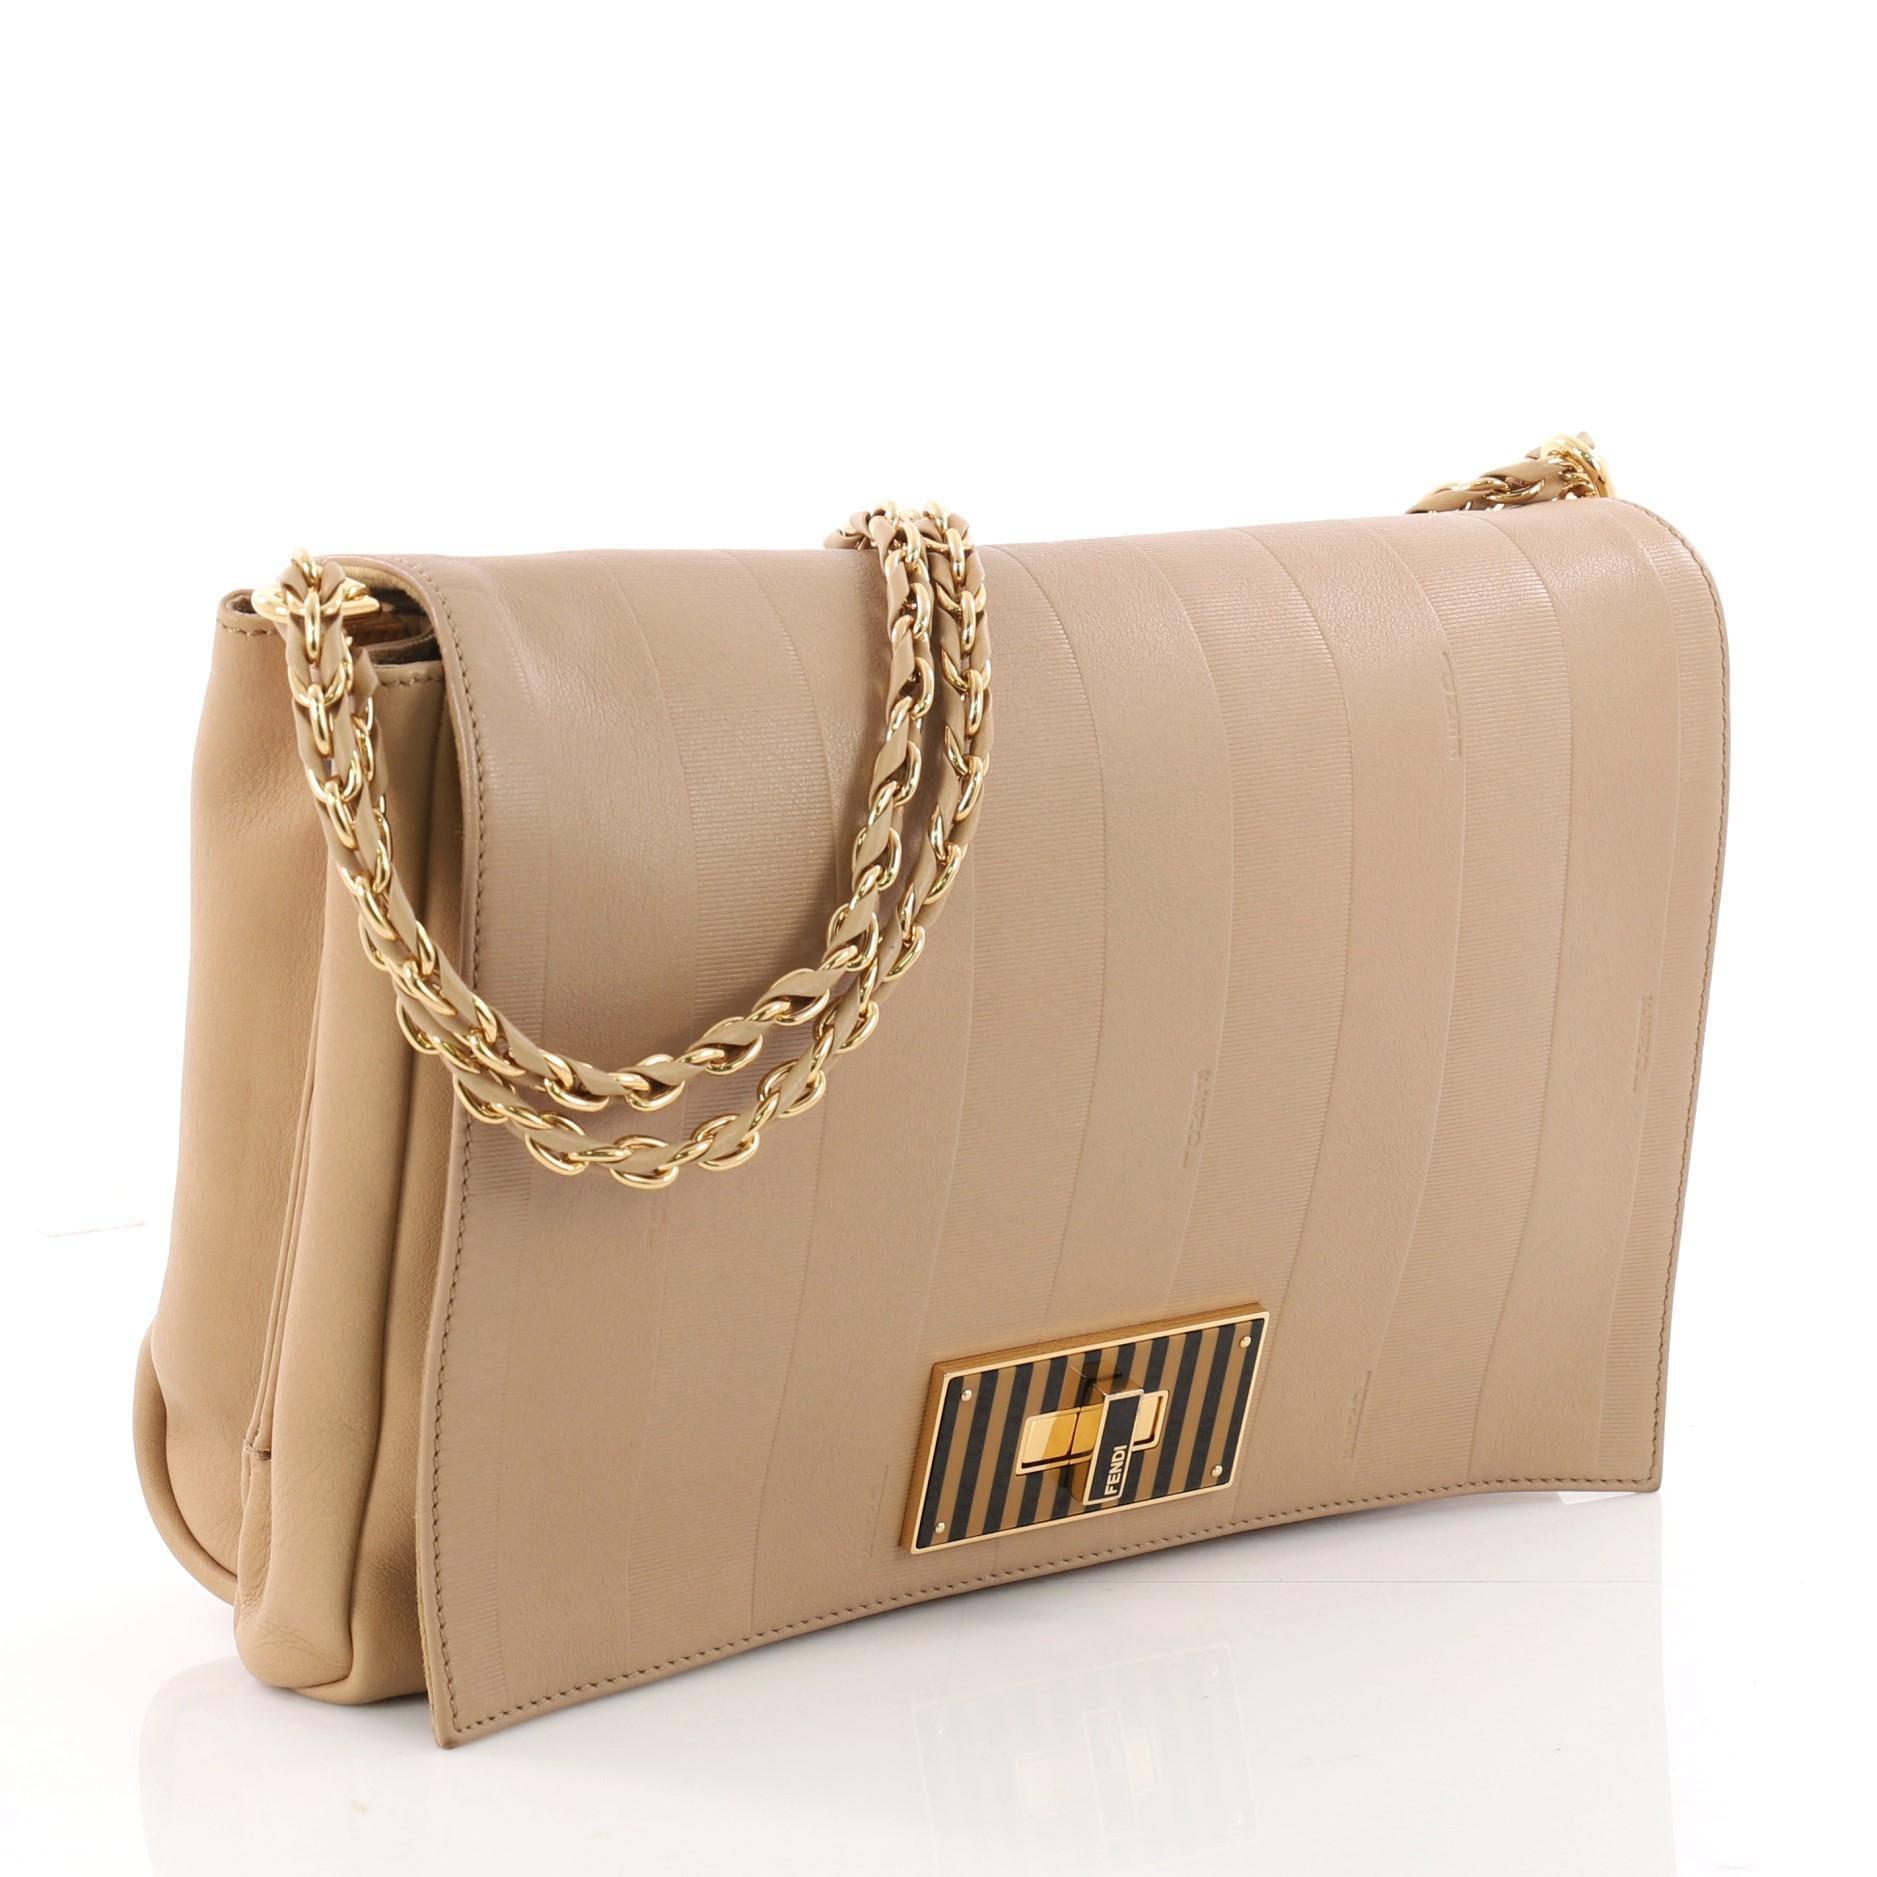 e41557bcf312 Fendi Claudia Shoulder Bag Pequin Embossed Leather Large at 1stdibs